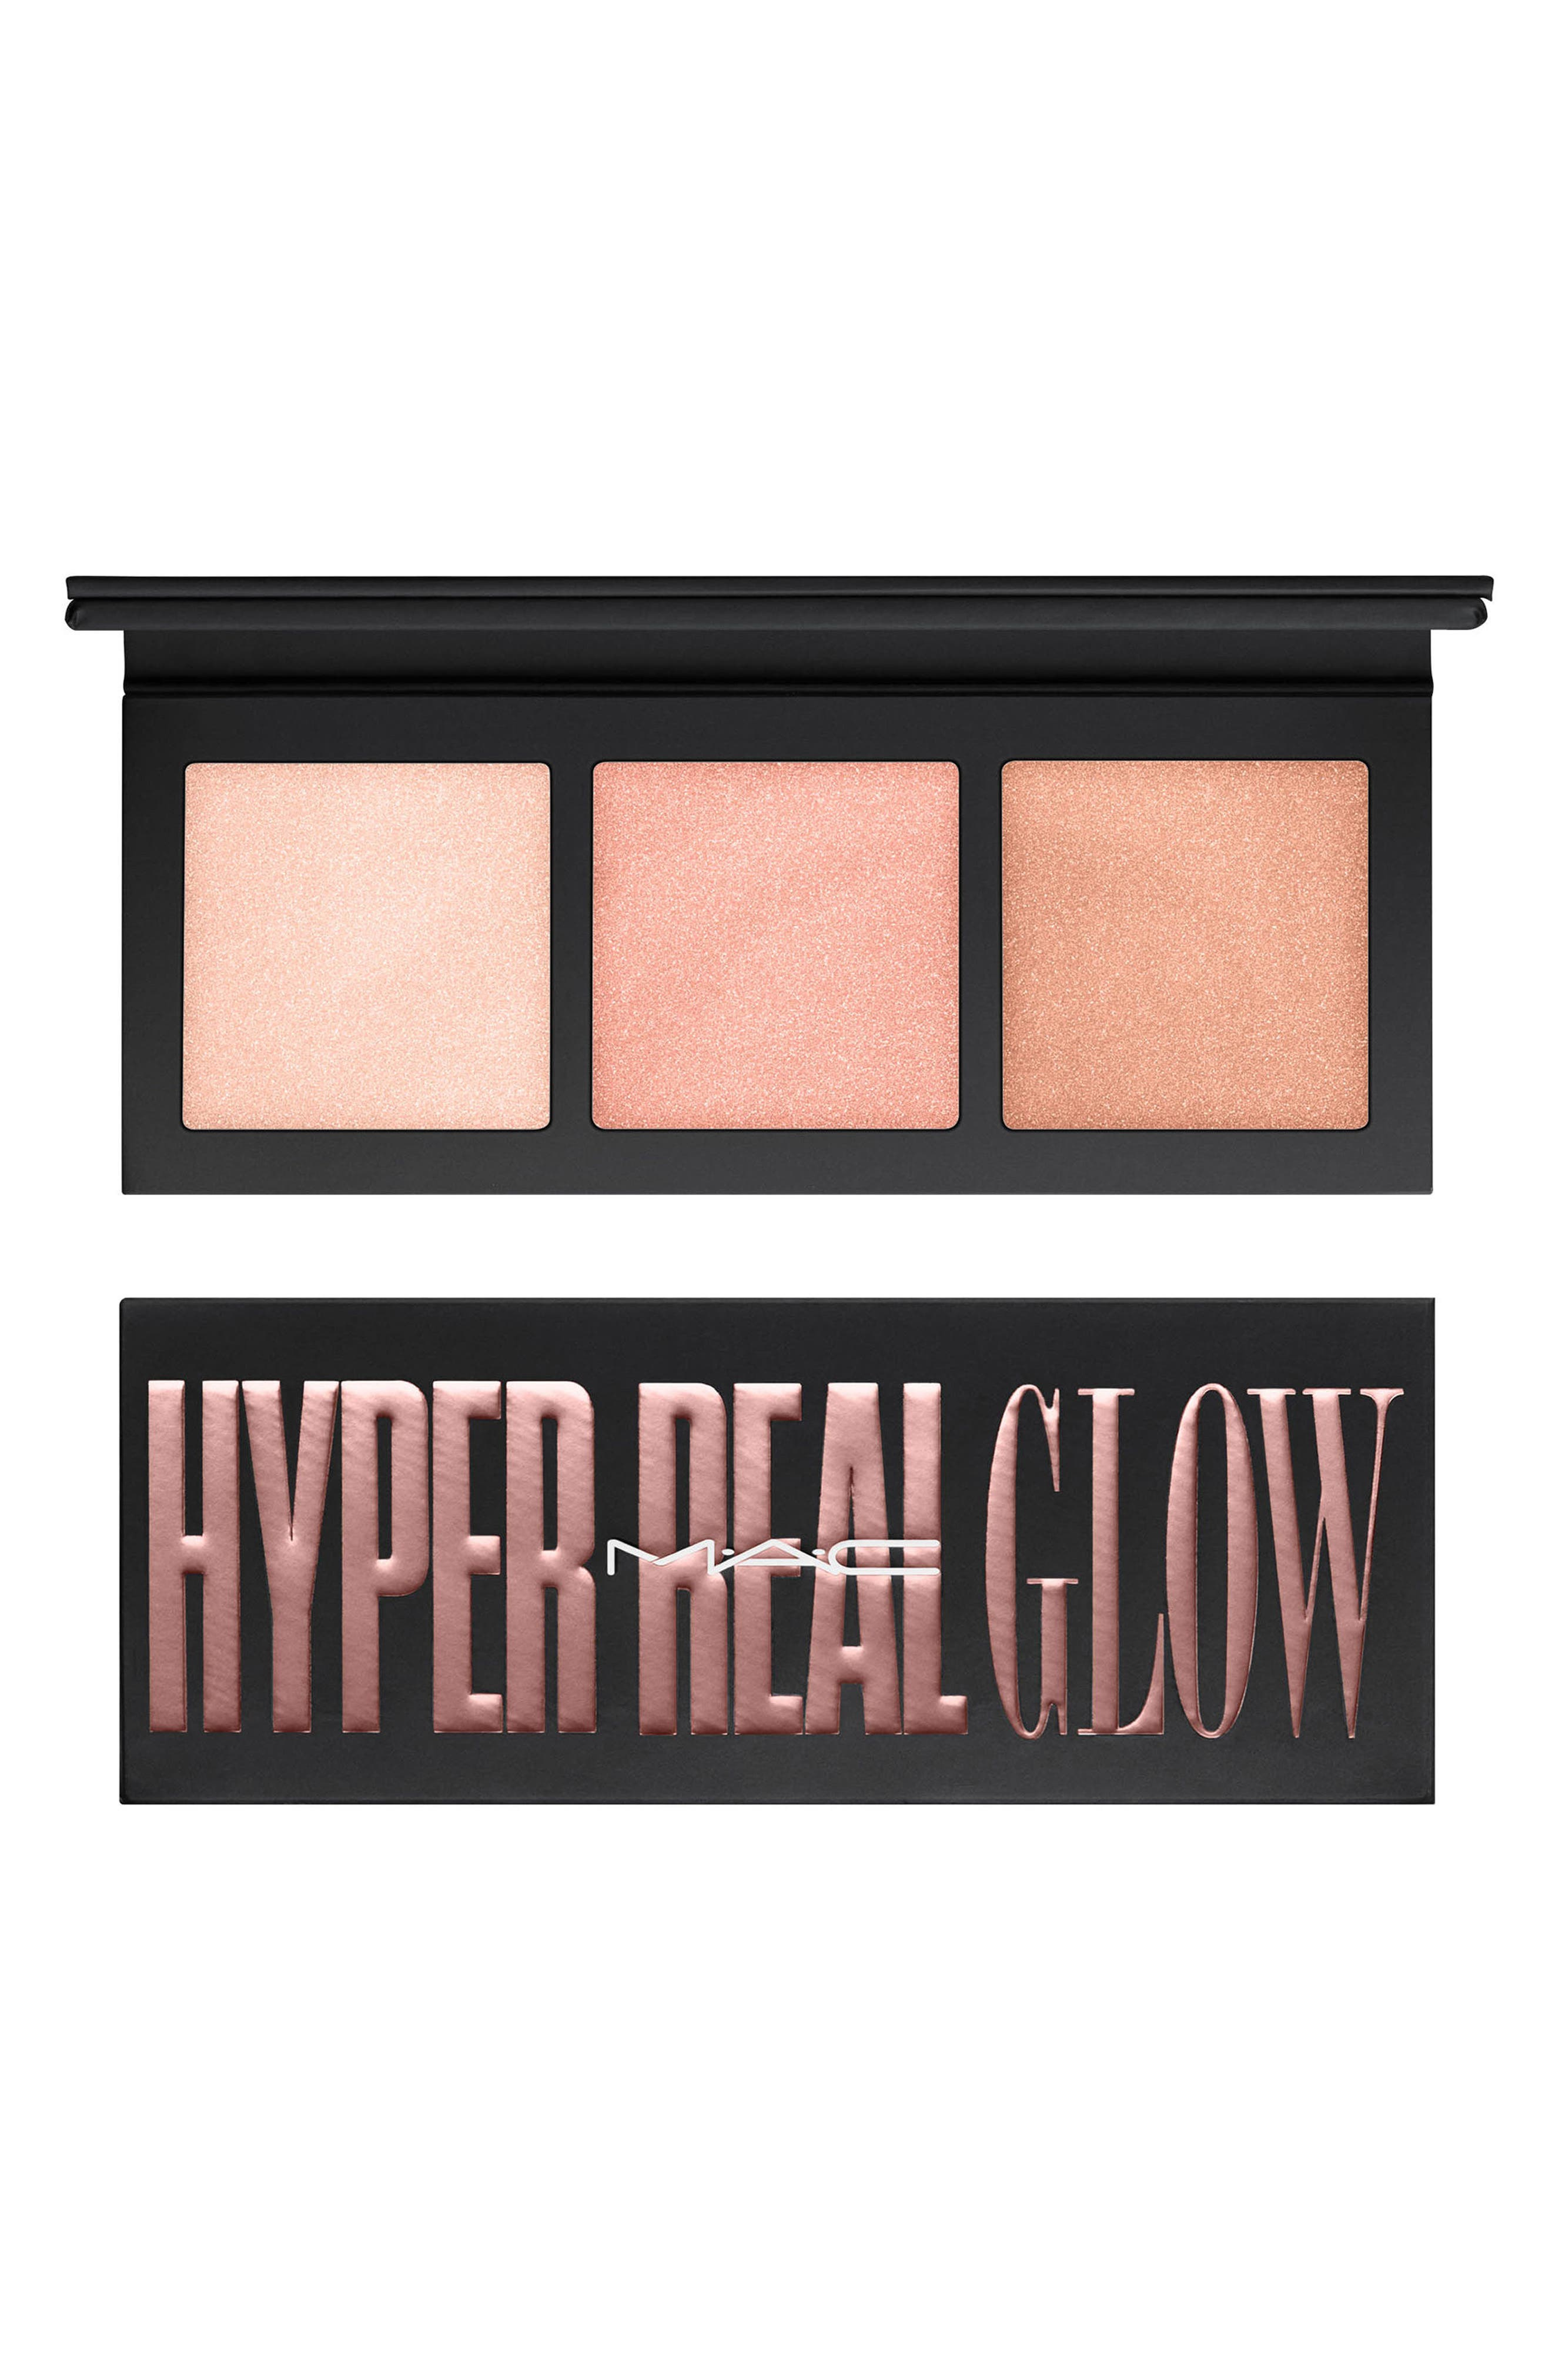 MAC Hyper Real Glow Palette,                             Main thumbnail 1, color,                             Flash Awe